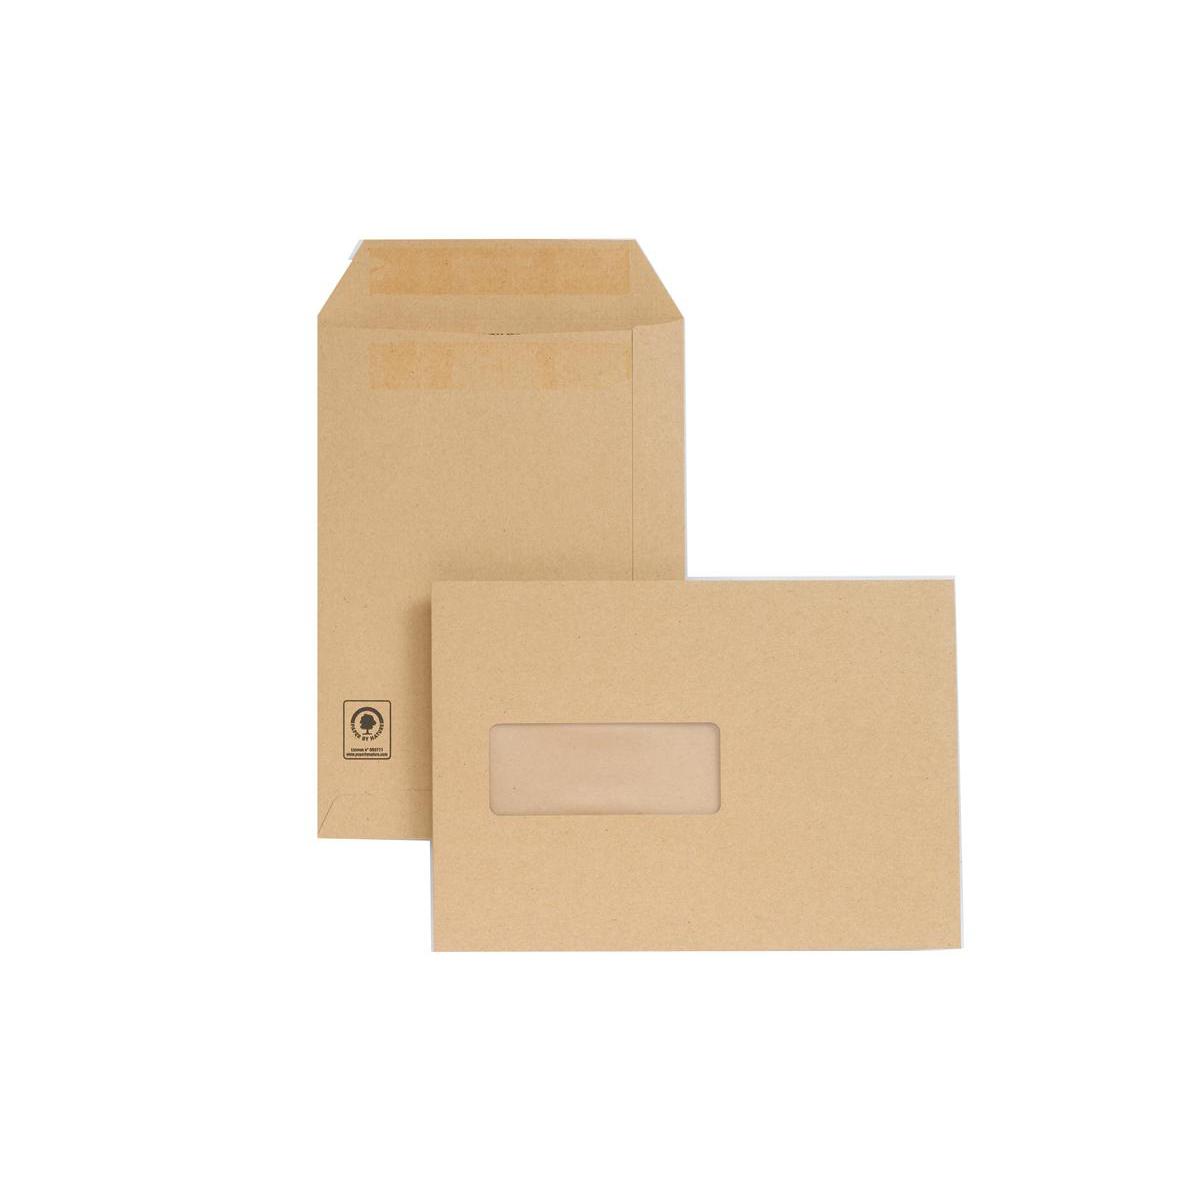 New Guardian Envelopes FSC Pocket Self Seal HvyWgt Wdw 130gsm C5 229x162mm Manilla Ref A23013 Pack 250